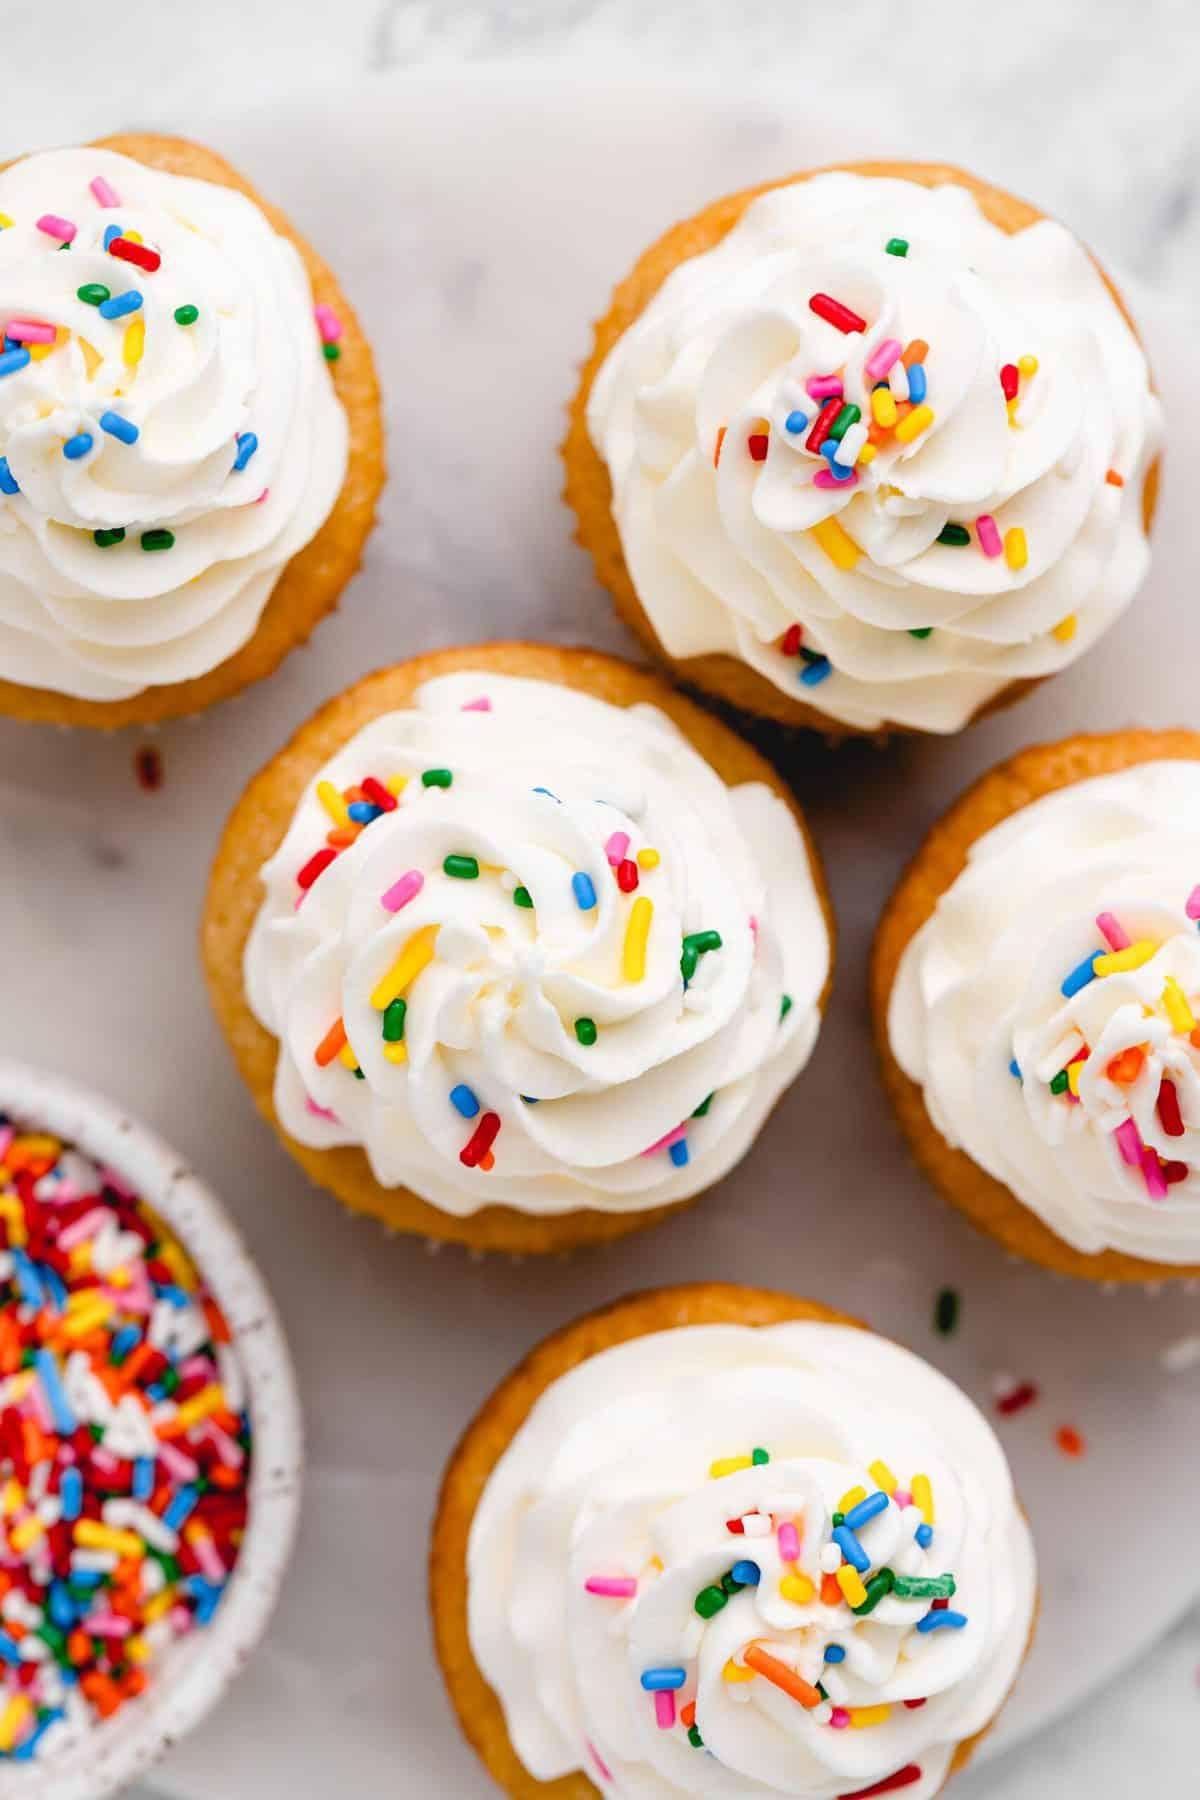 Vanilla cupcakes with vanilla buttercream frosting.